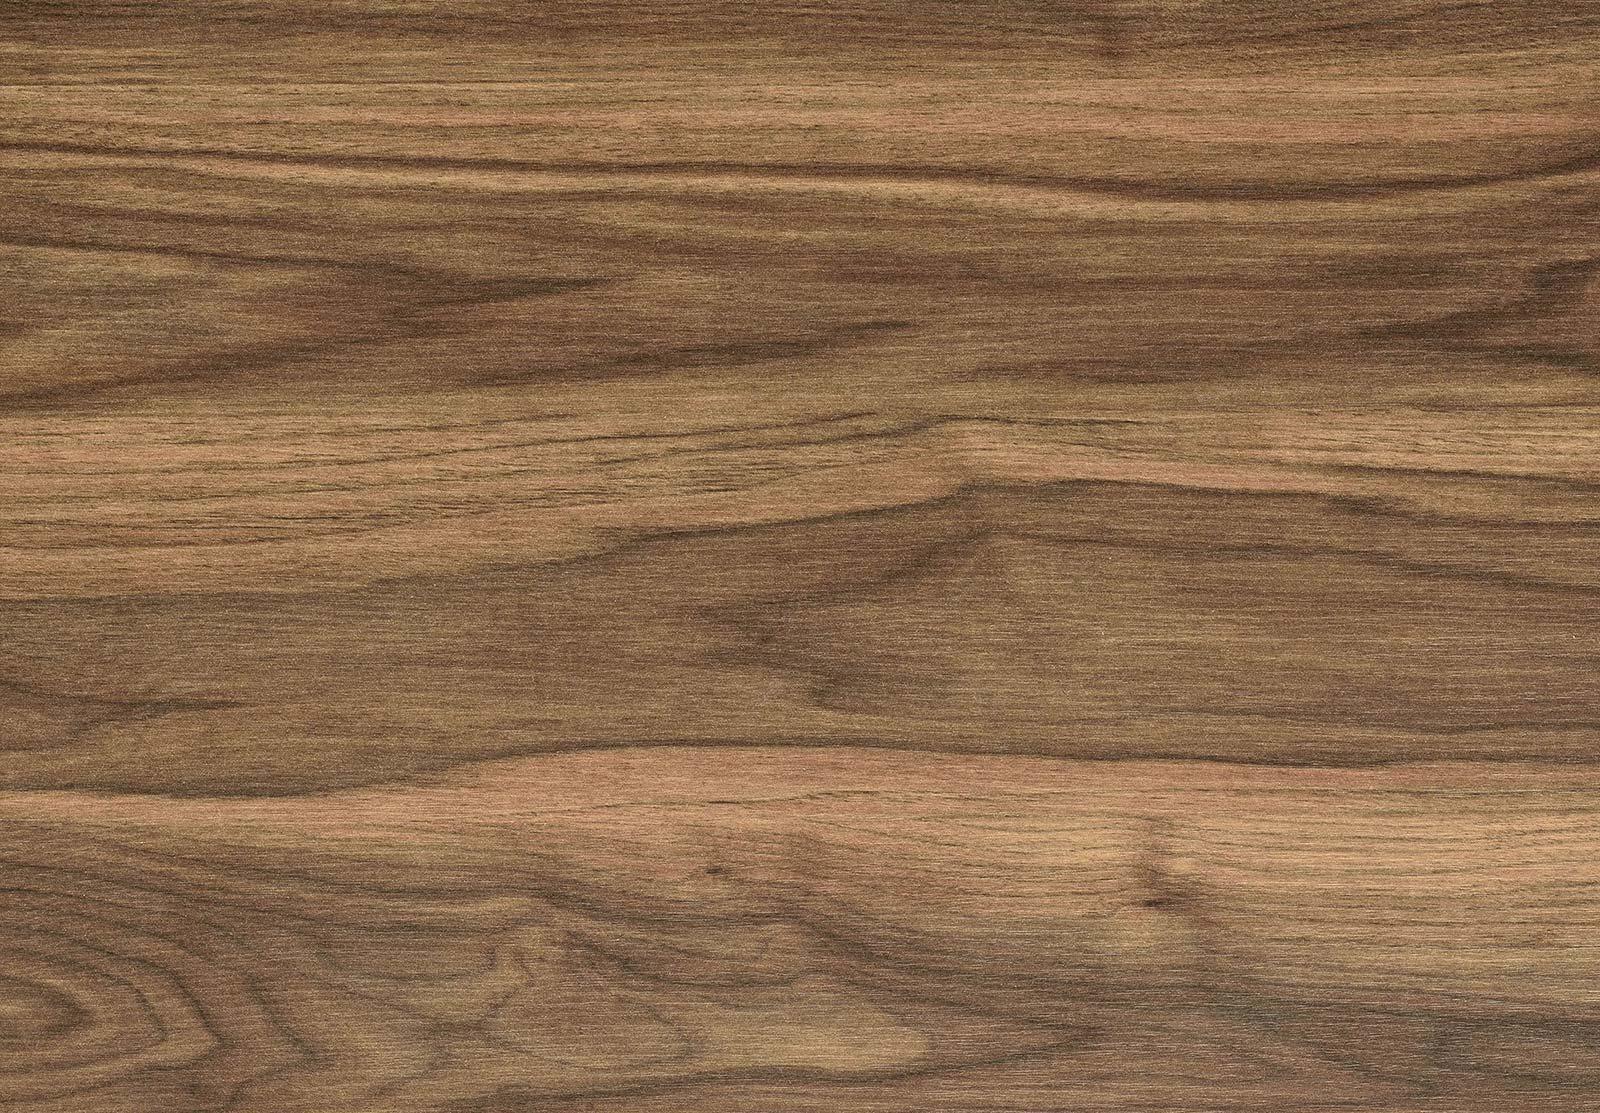 Pannelli alfawood - Noce Lirico 9310